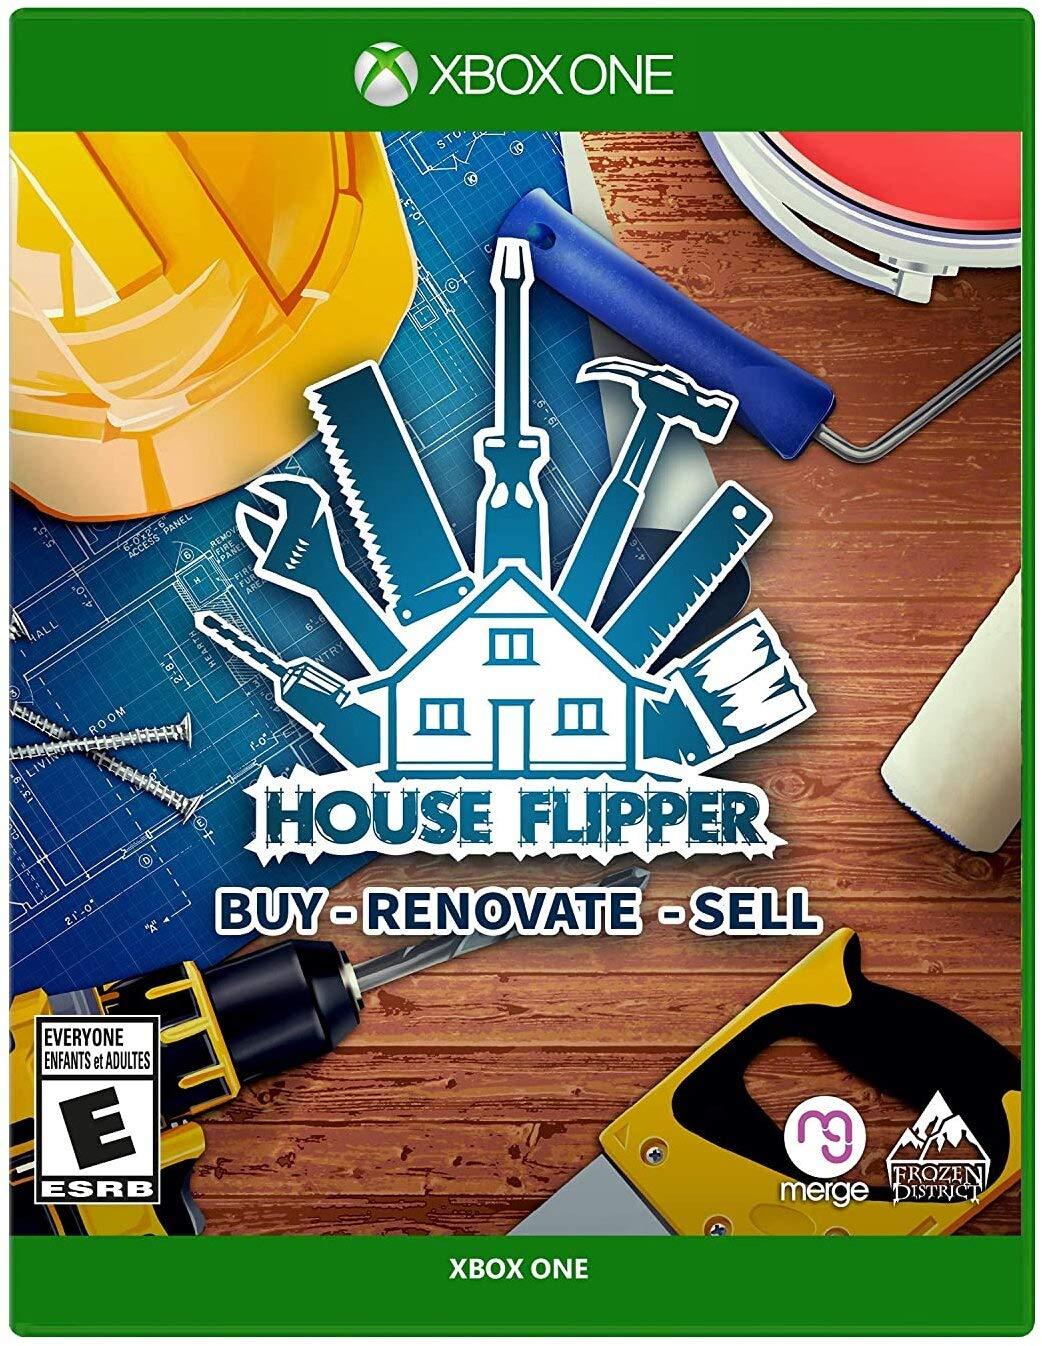 House Flipper for Xbox One [USA]: Amazon.es: Crescent Marketing Inc, Crescent Marketing: Cine y Series TV